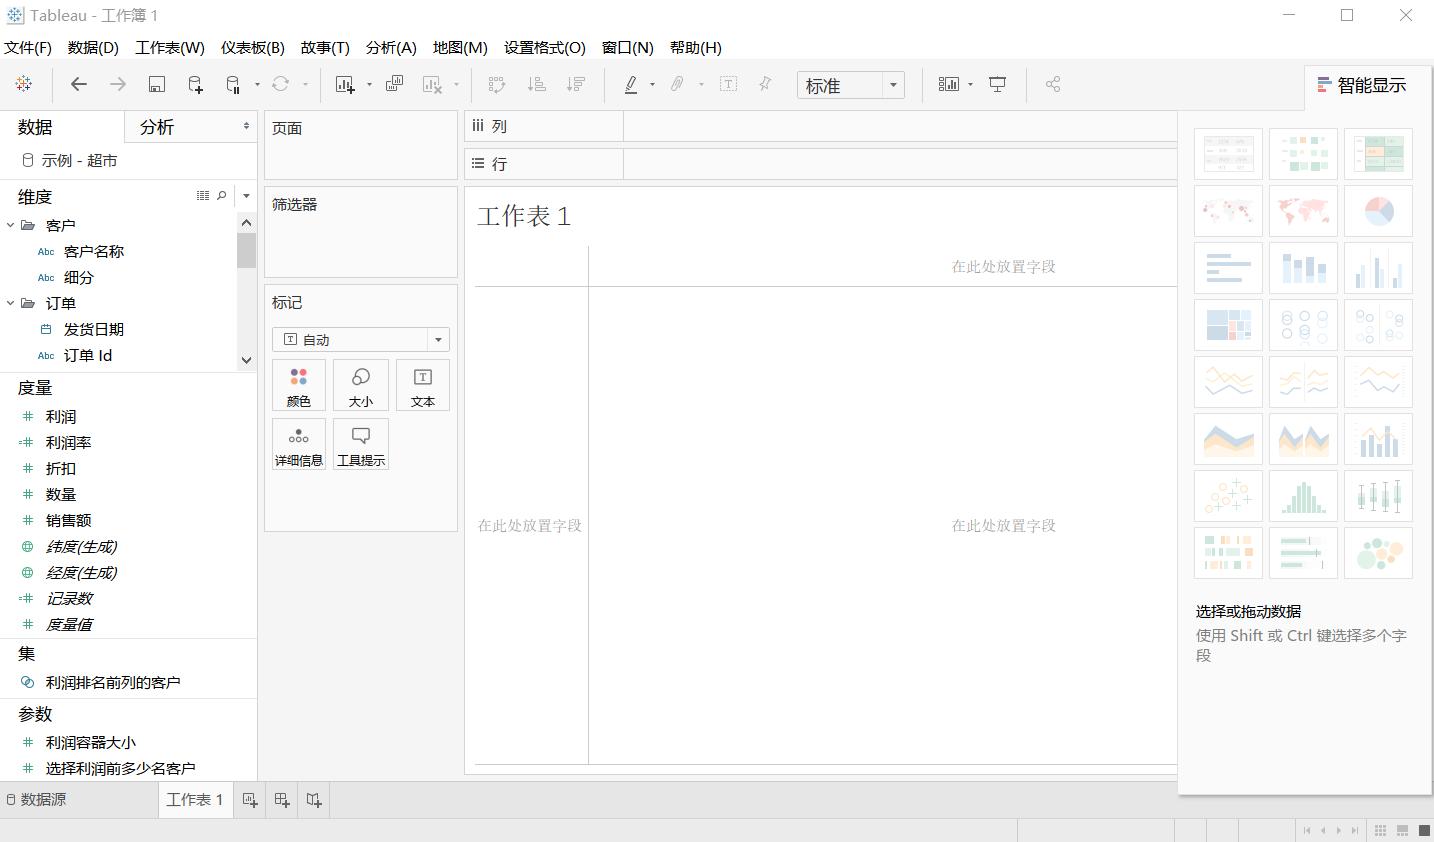 Tableau Desktop Pro v2019.4.2 专业结构数据分析软件